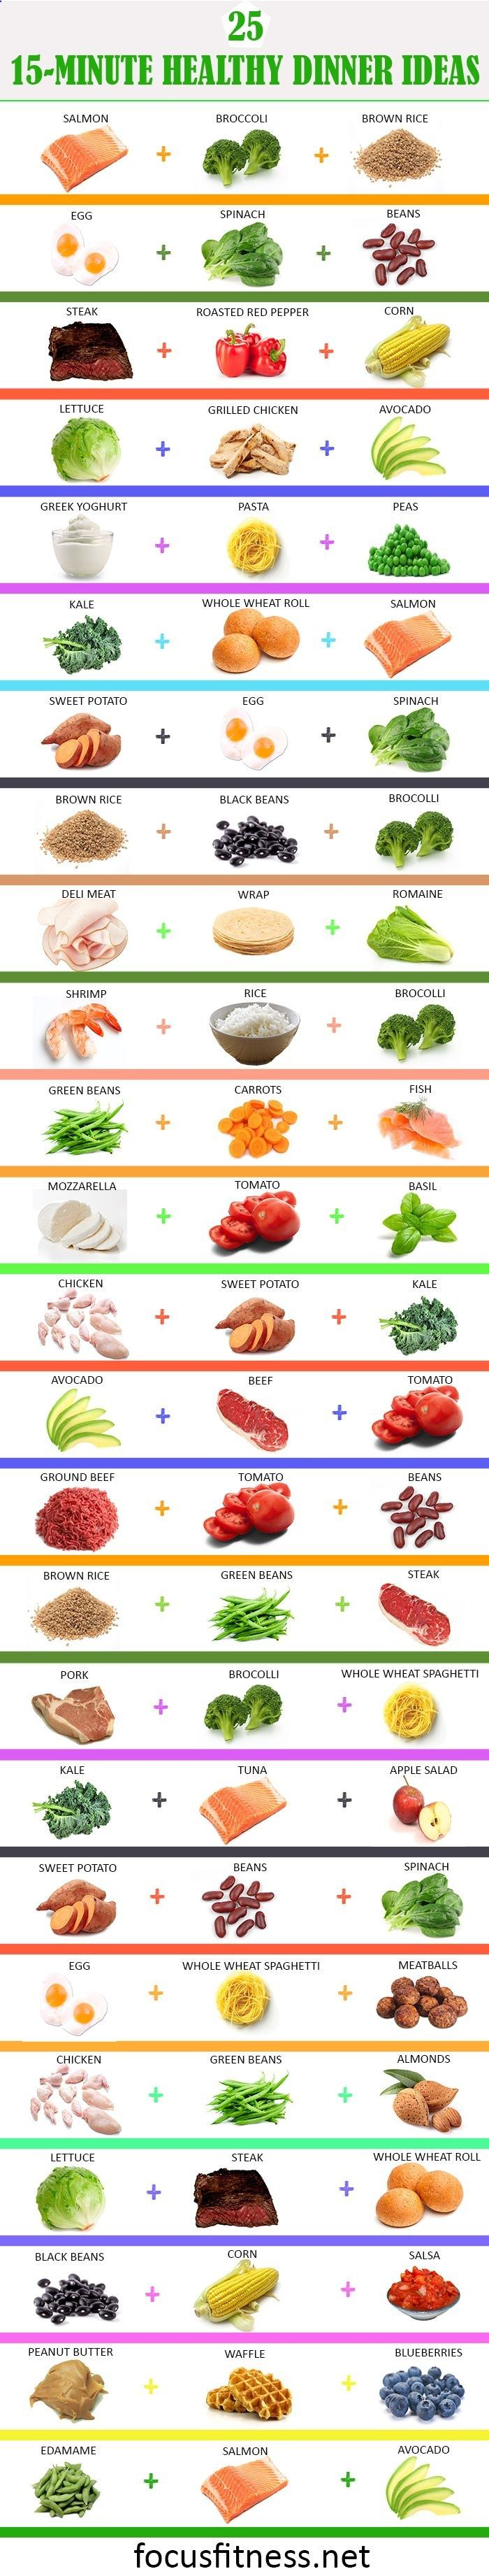 Healthy dinner ideas available here!